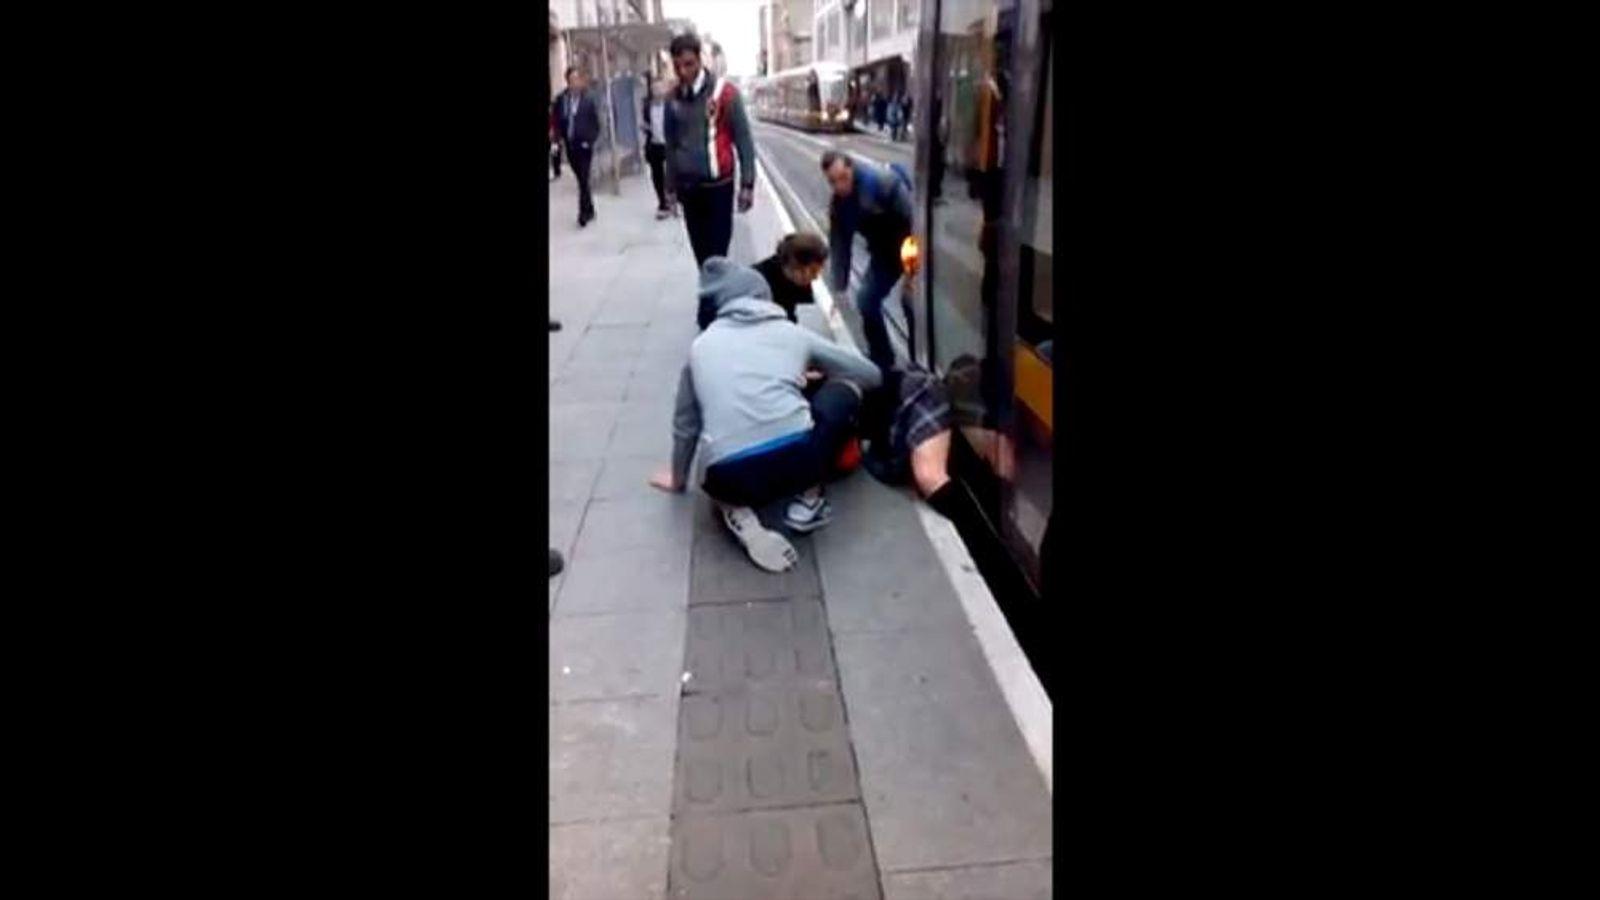 Commuters Rescue Girl Trapped Under Tram In Dublin